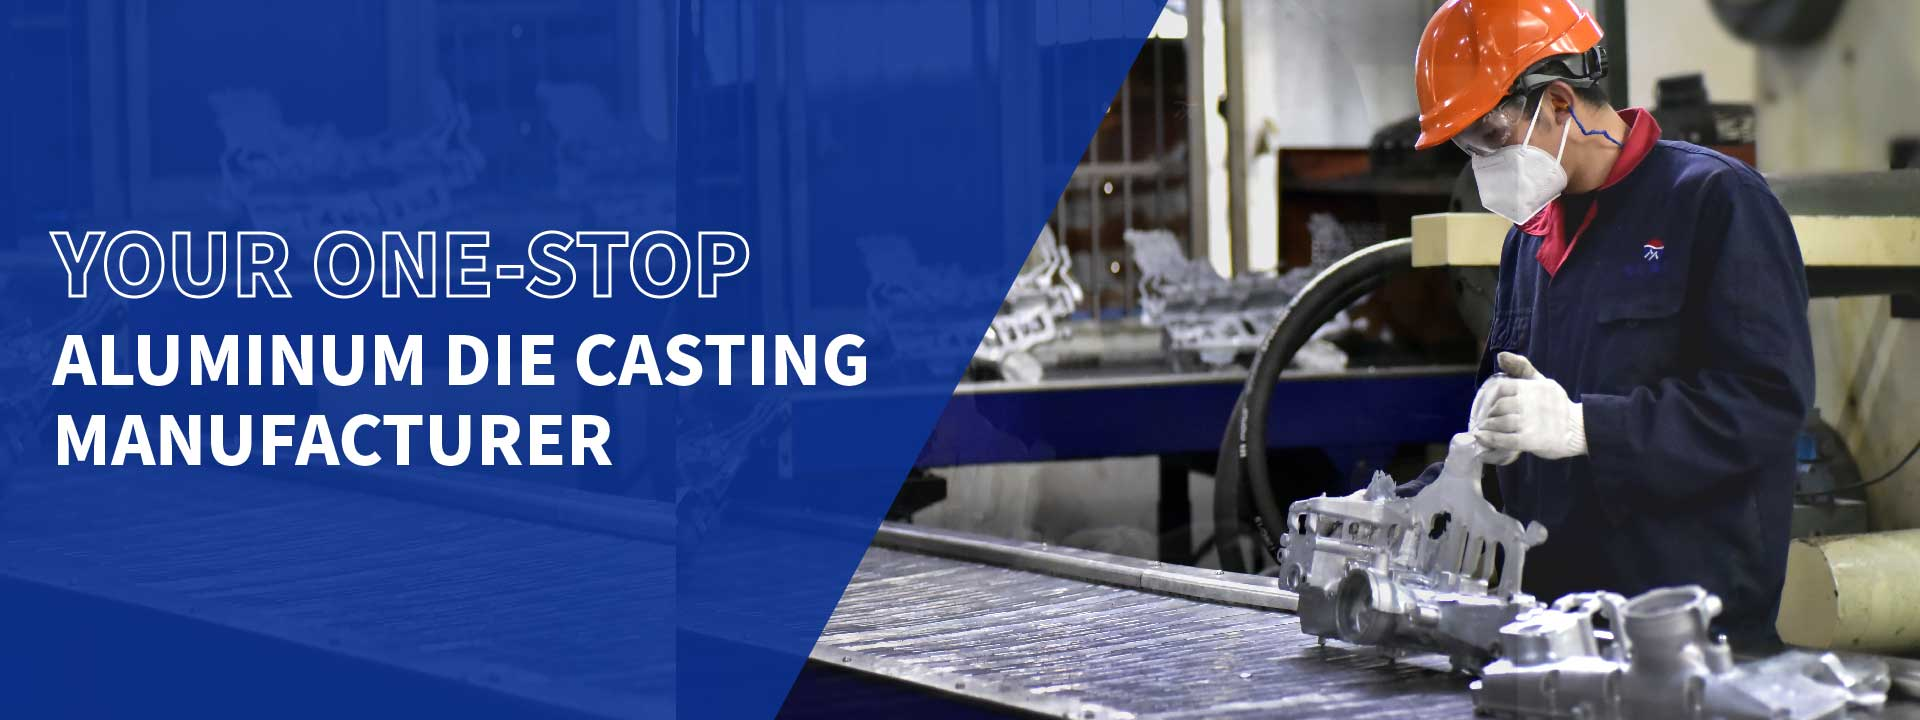 Aluminum-Die-Casting-Manufacturer-banner